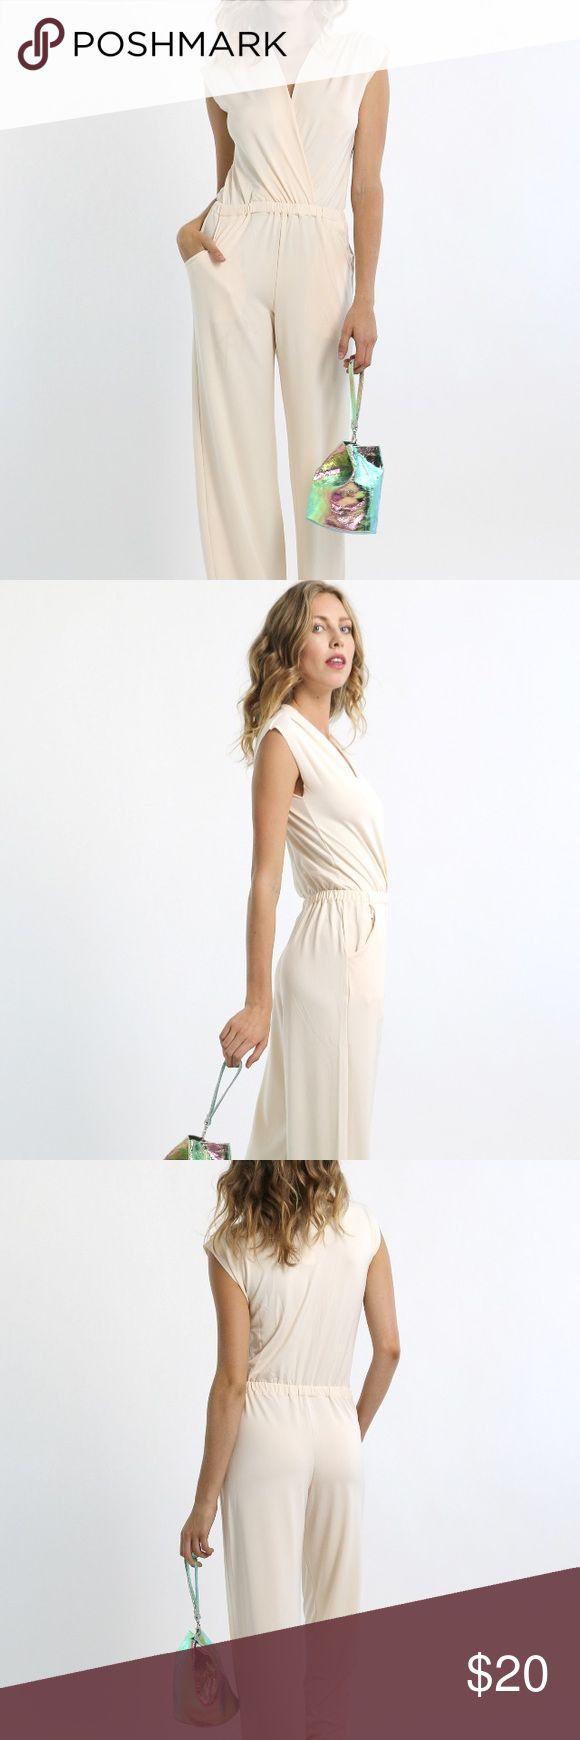 Selling this RIPLEY RADAR designer cream jumpsuit M on Poshmark! My username is: emilyjtruax. #shopmycloset #poshmark #fashion #shopping #style #forsale #ripley radar #Pants